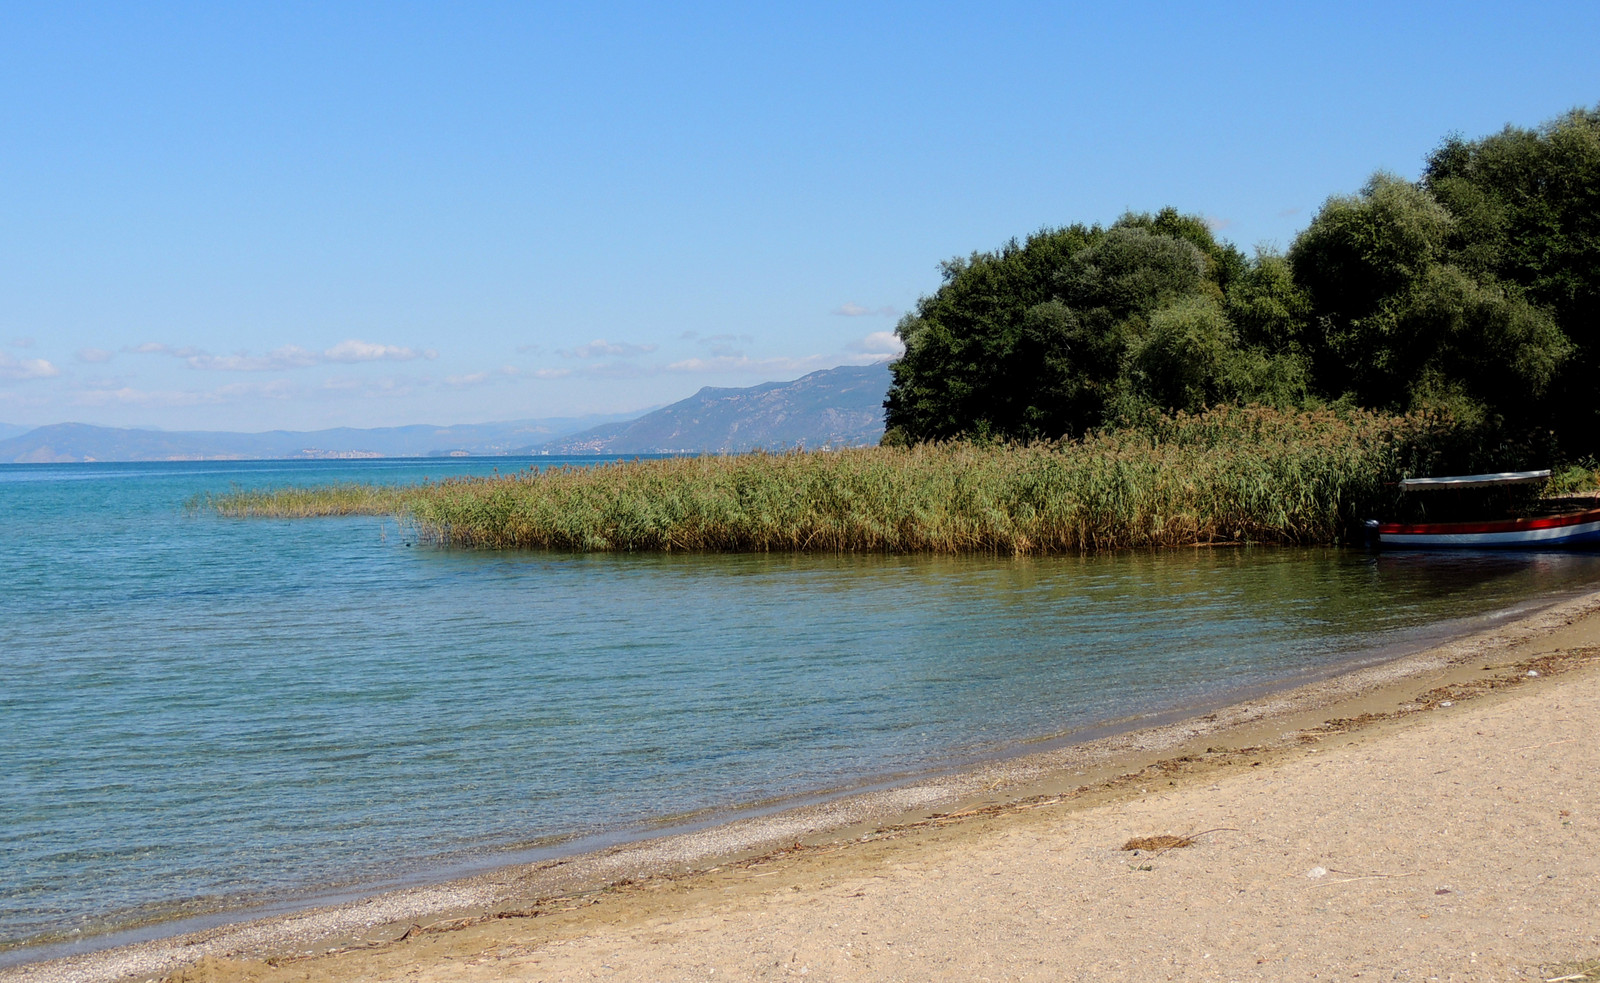 Ohrid-See bei Kloster Naum